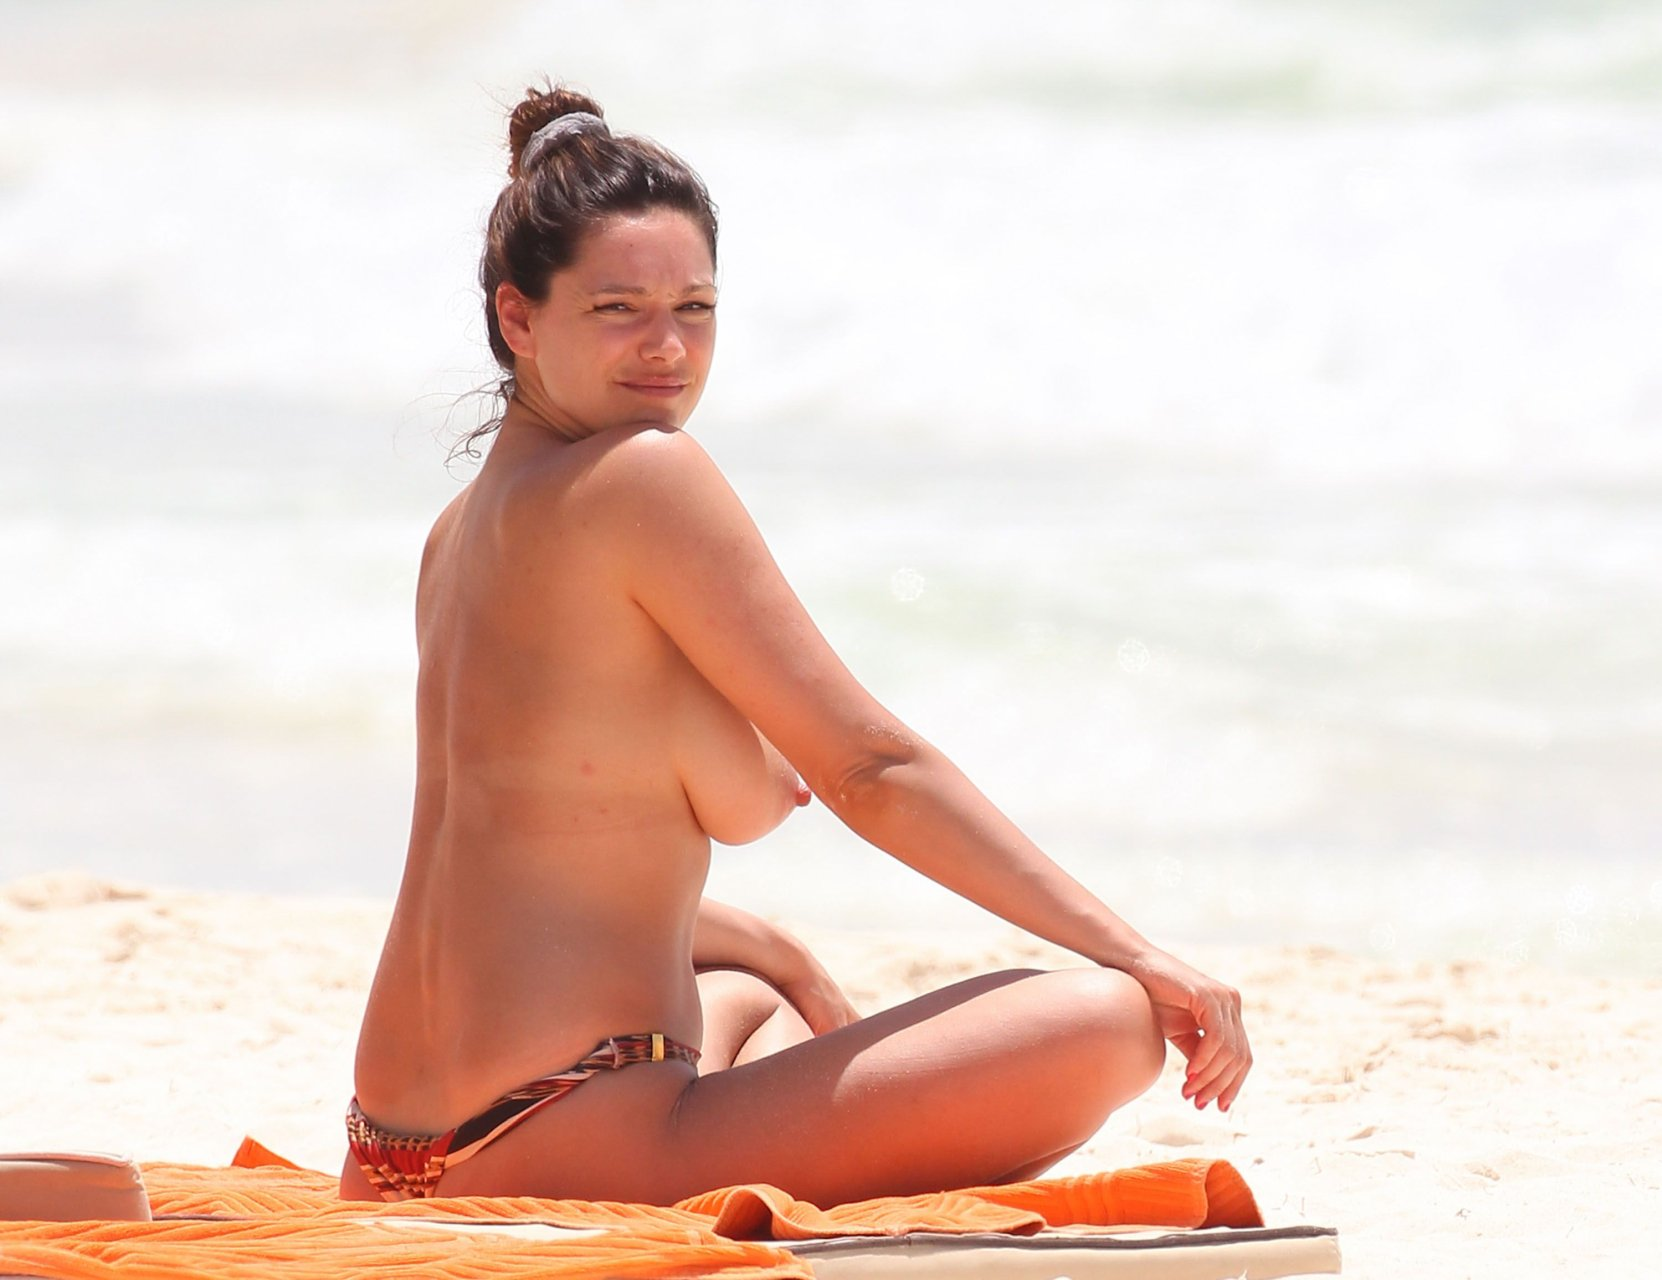 Nude Cancun Nude Beach Gallery Photos